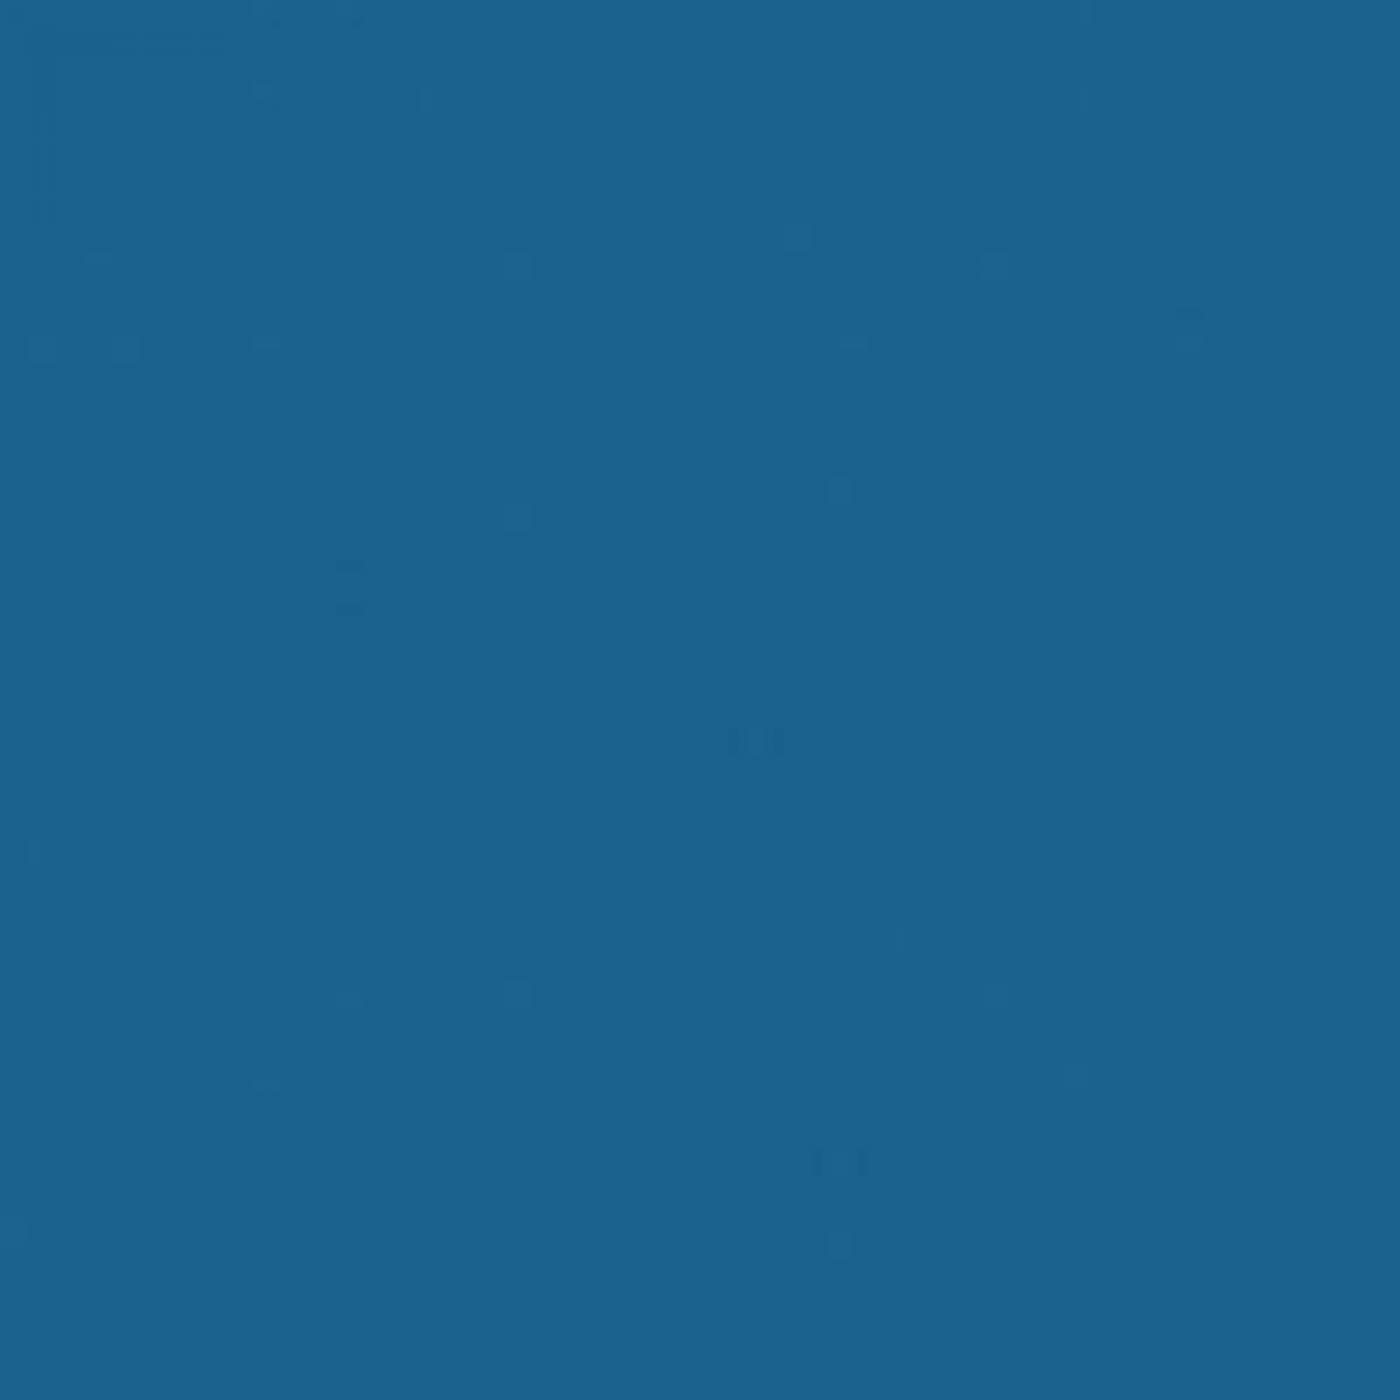 blueforsudan.jpg